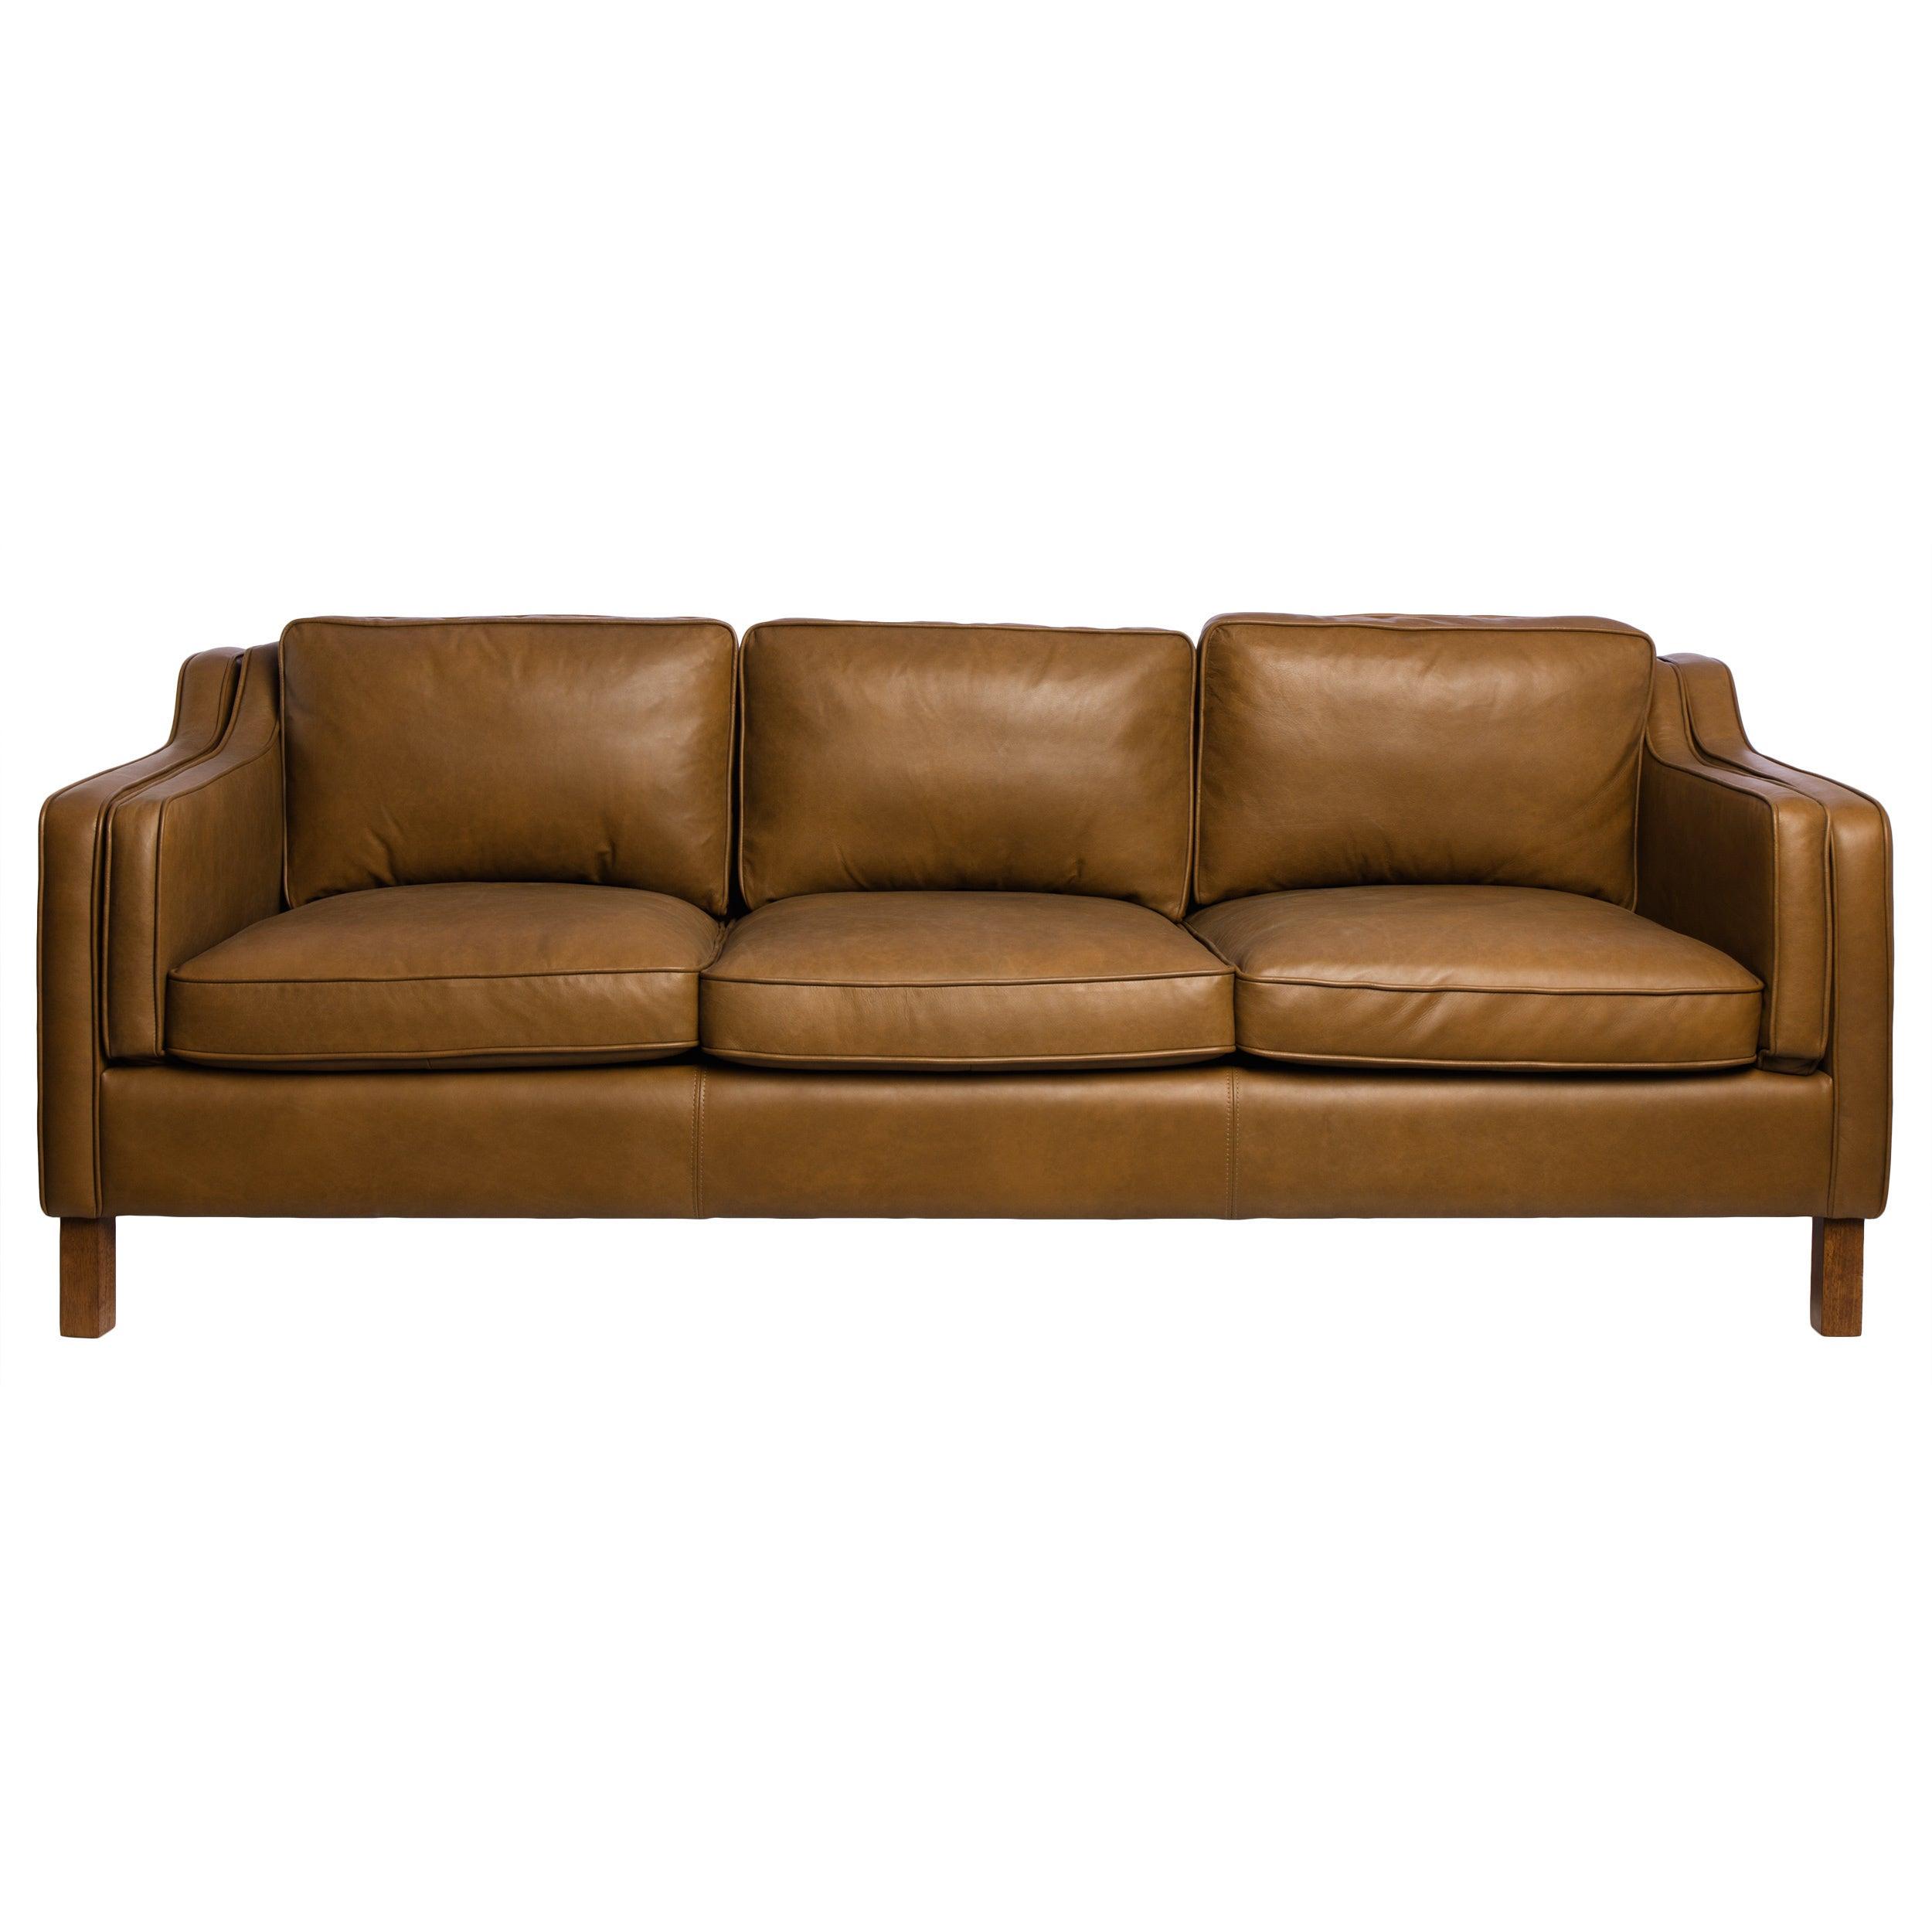 Full Size of Canape Sofa Shop Strick Bolton 86 Inch Oxford Honey Leather Goodlife U Form Mit Schlaffunktion Federkern Chippendale Baxter Günstig Kaufen Zweisitzer Höffner Sofa Canape Sofa